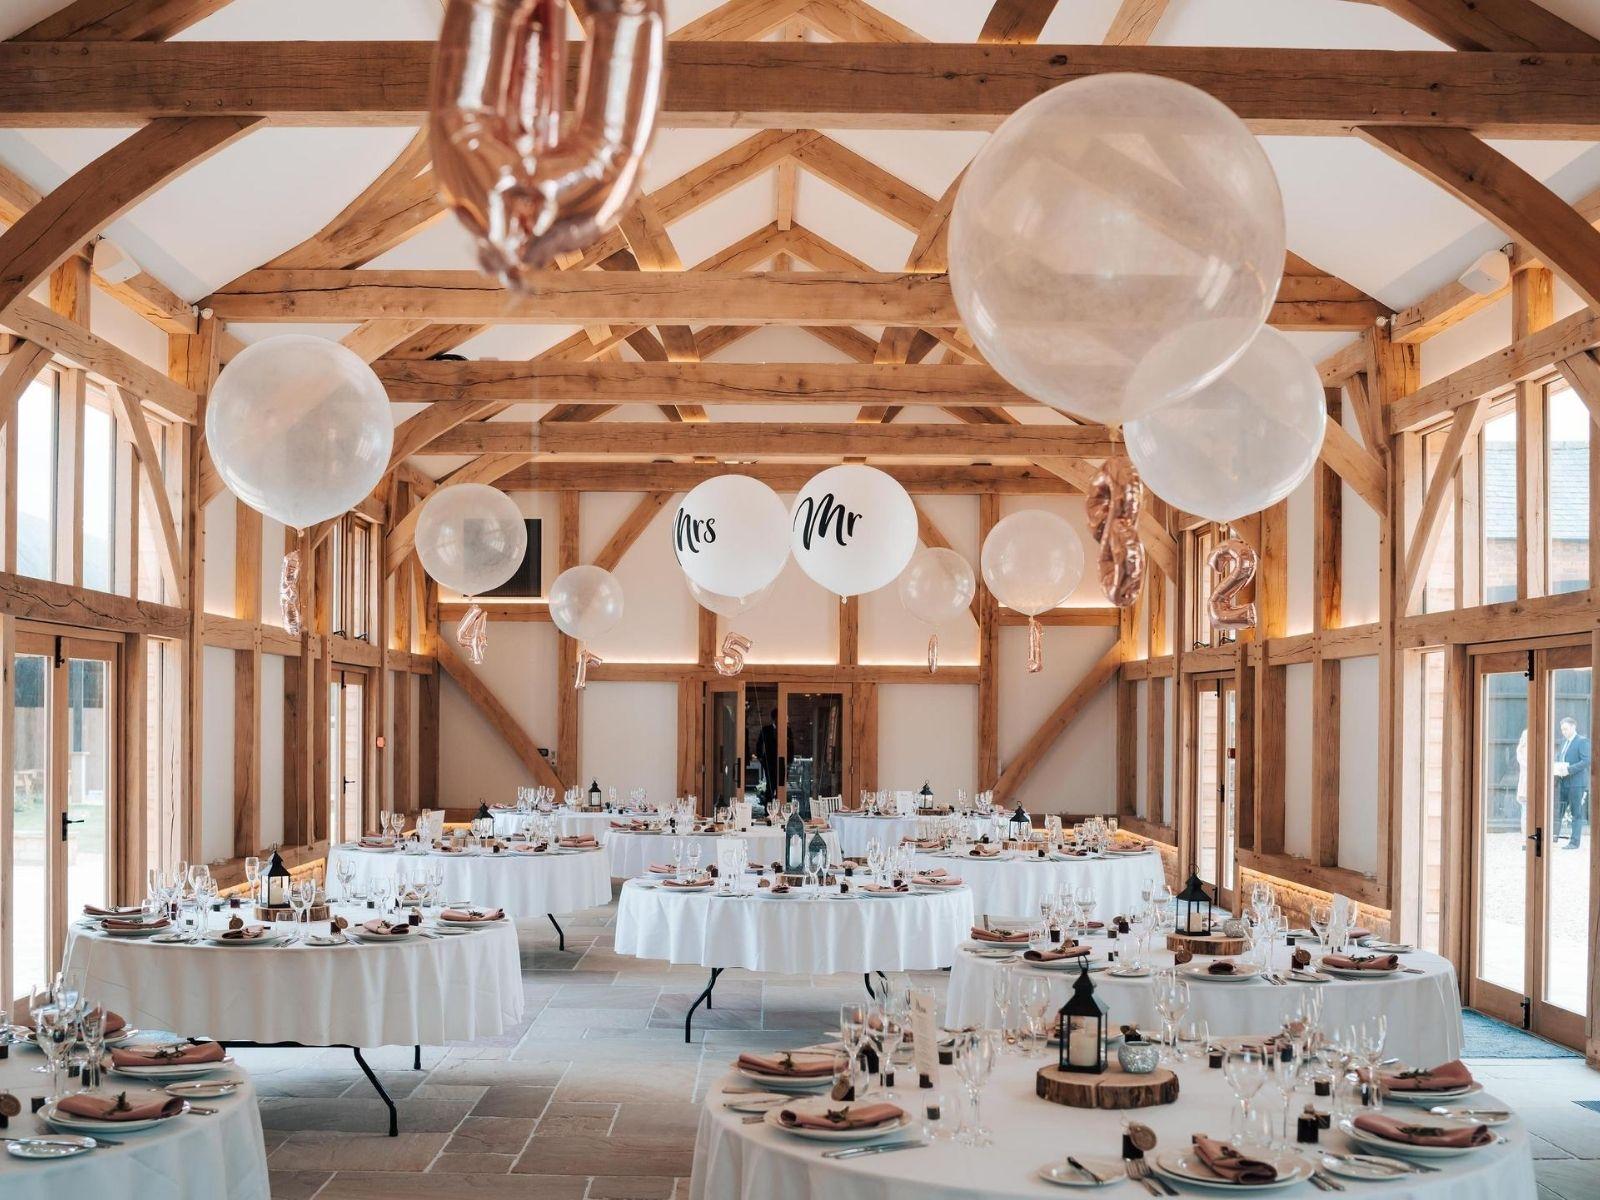 wedding reception at Mickleton Hills Farm wedding venue in Chipping Campden